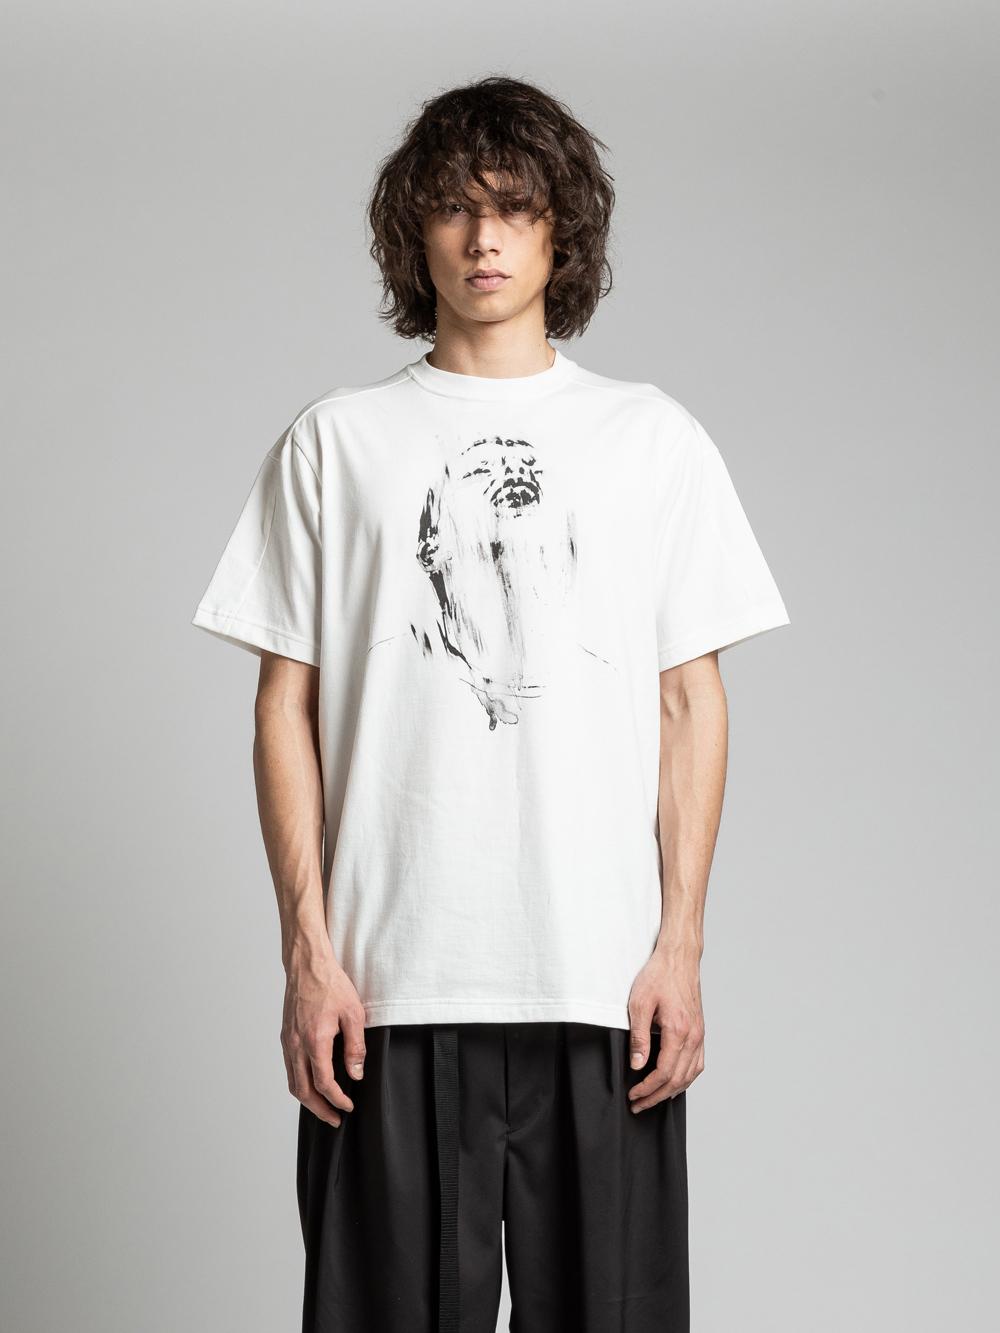 VI-PM-015-01 / PATRICIA MARCH コラボレーション プリント 半袖Tシャツ